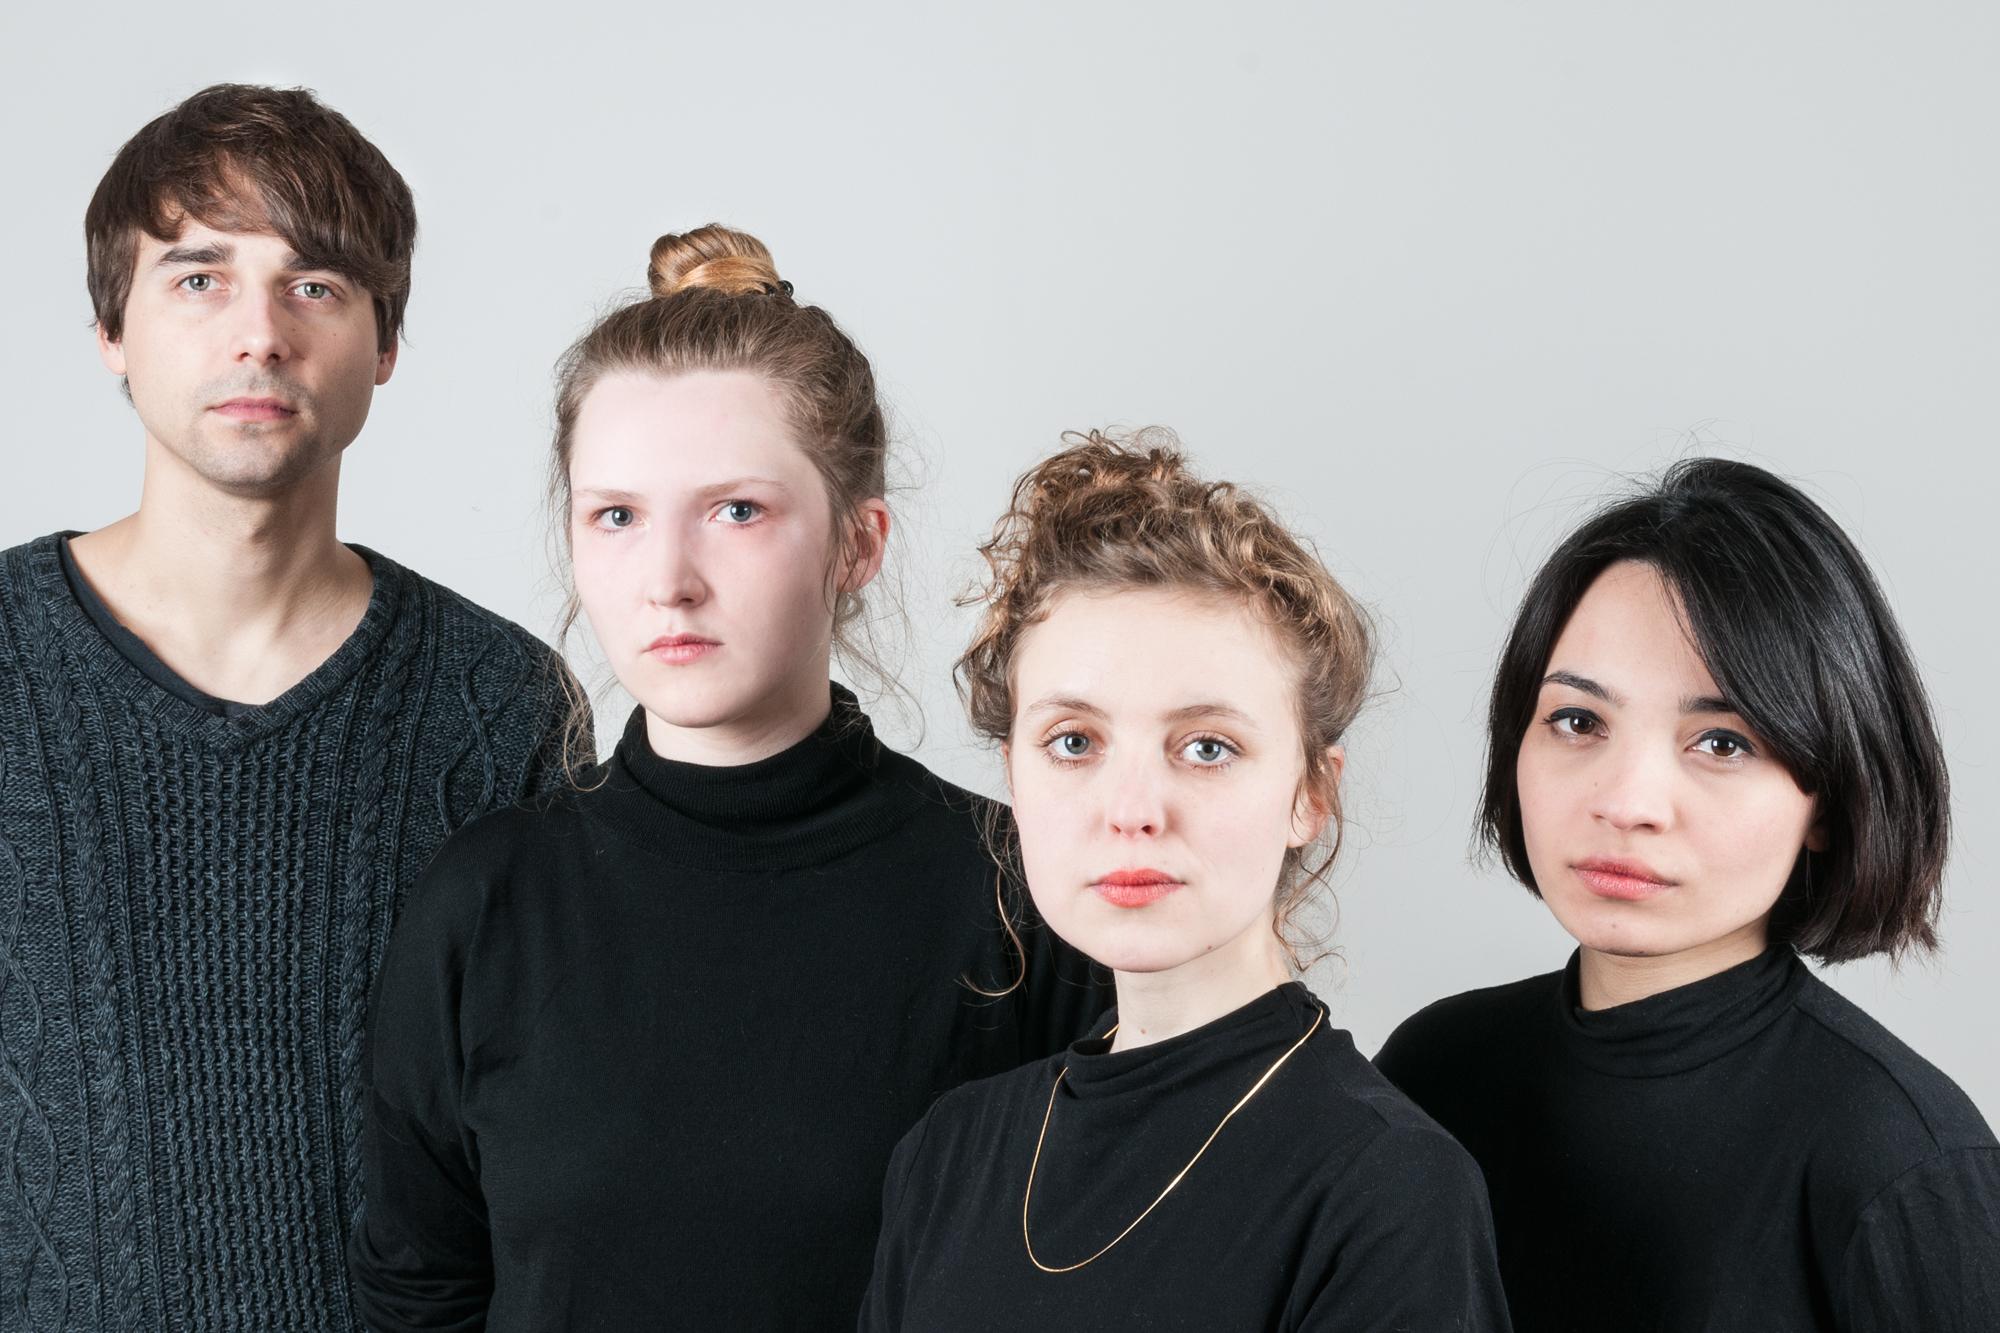 VLNR: Philipp Wulf, Stella Sommer, Sonja Deffner, Hanitra Wagner